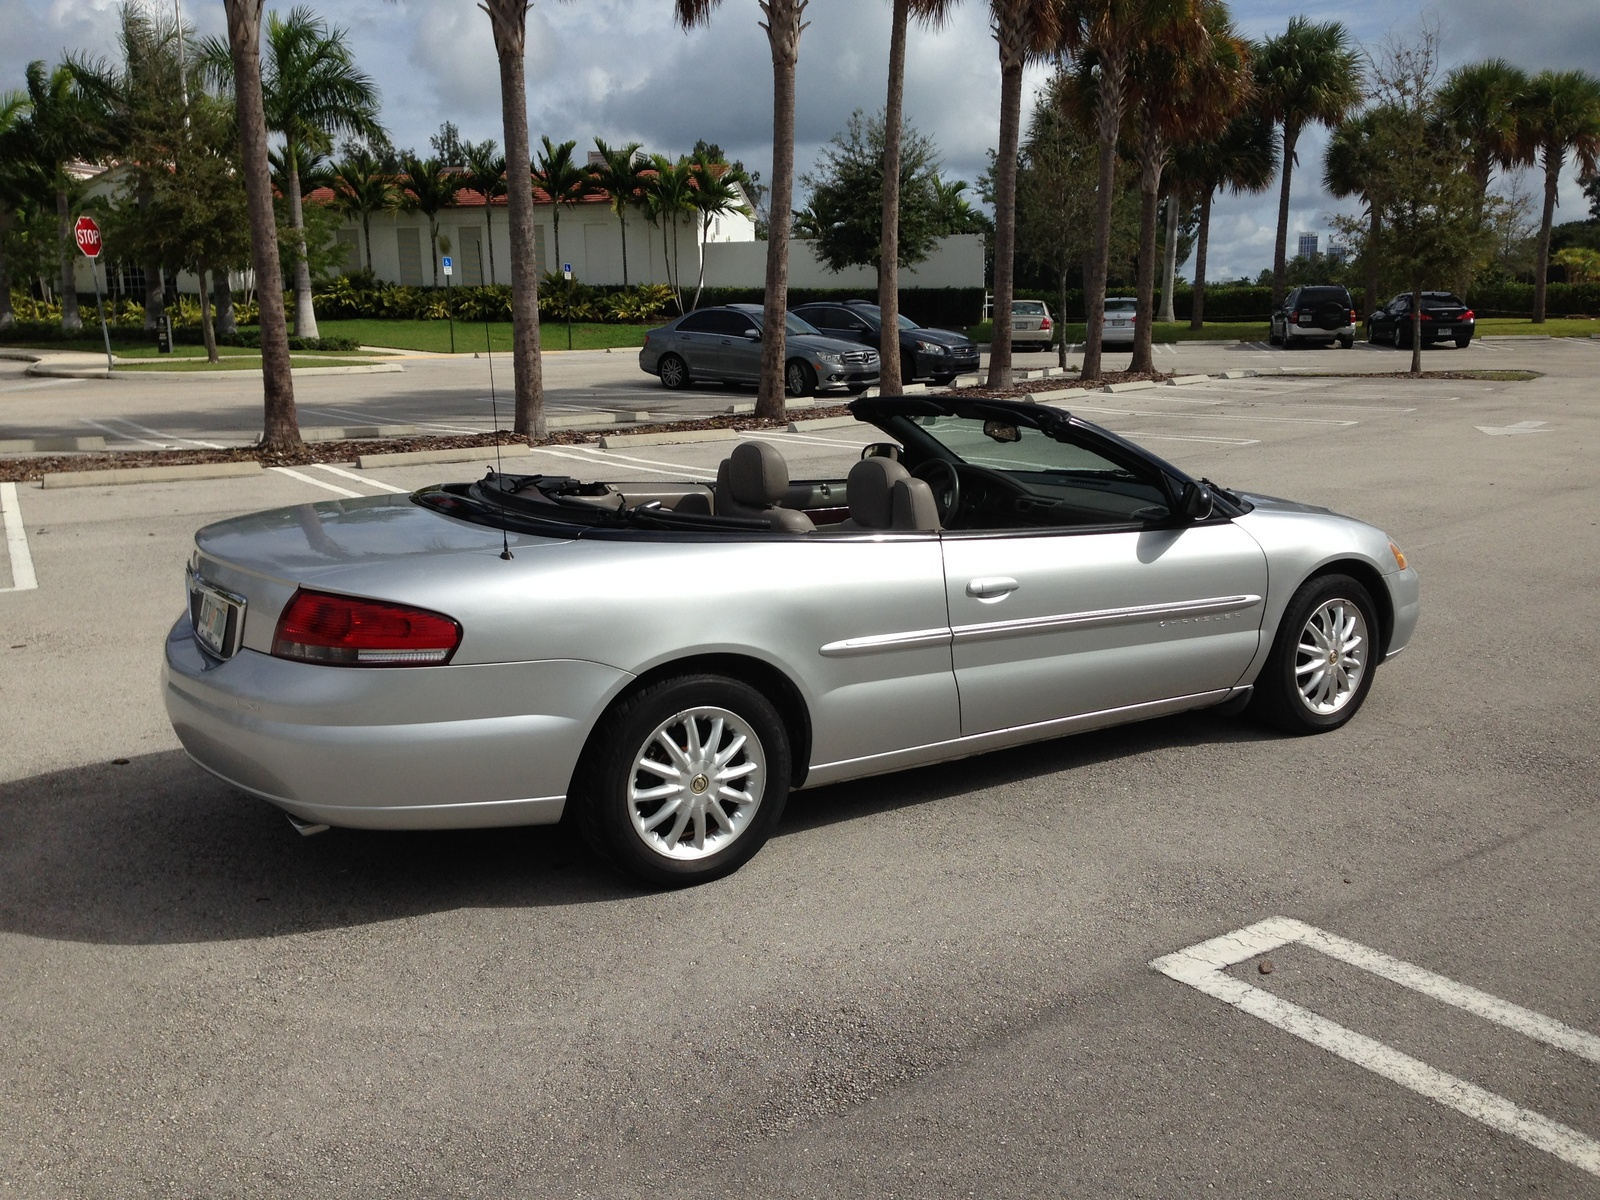 2001 Chrysler Sebring - Exterior Pictures